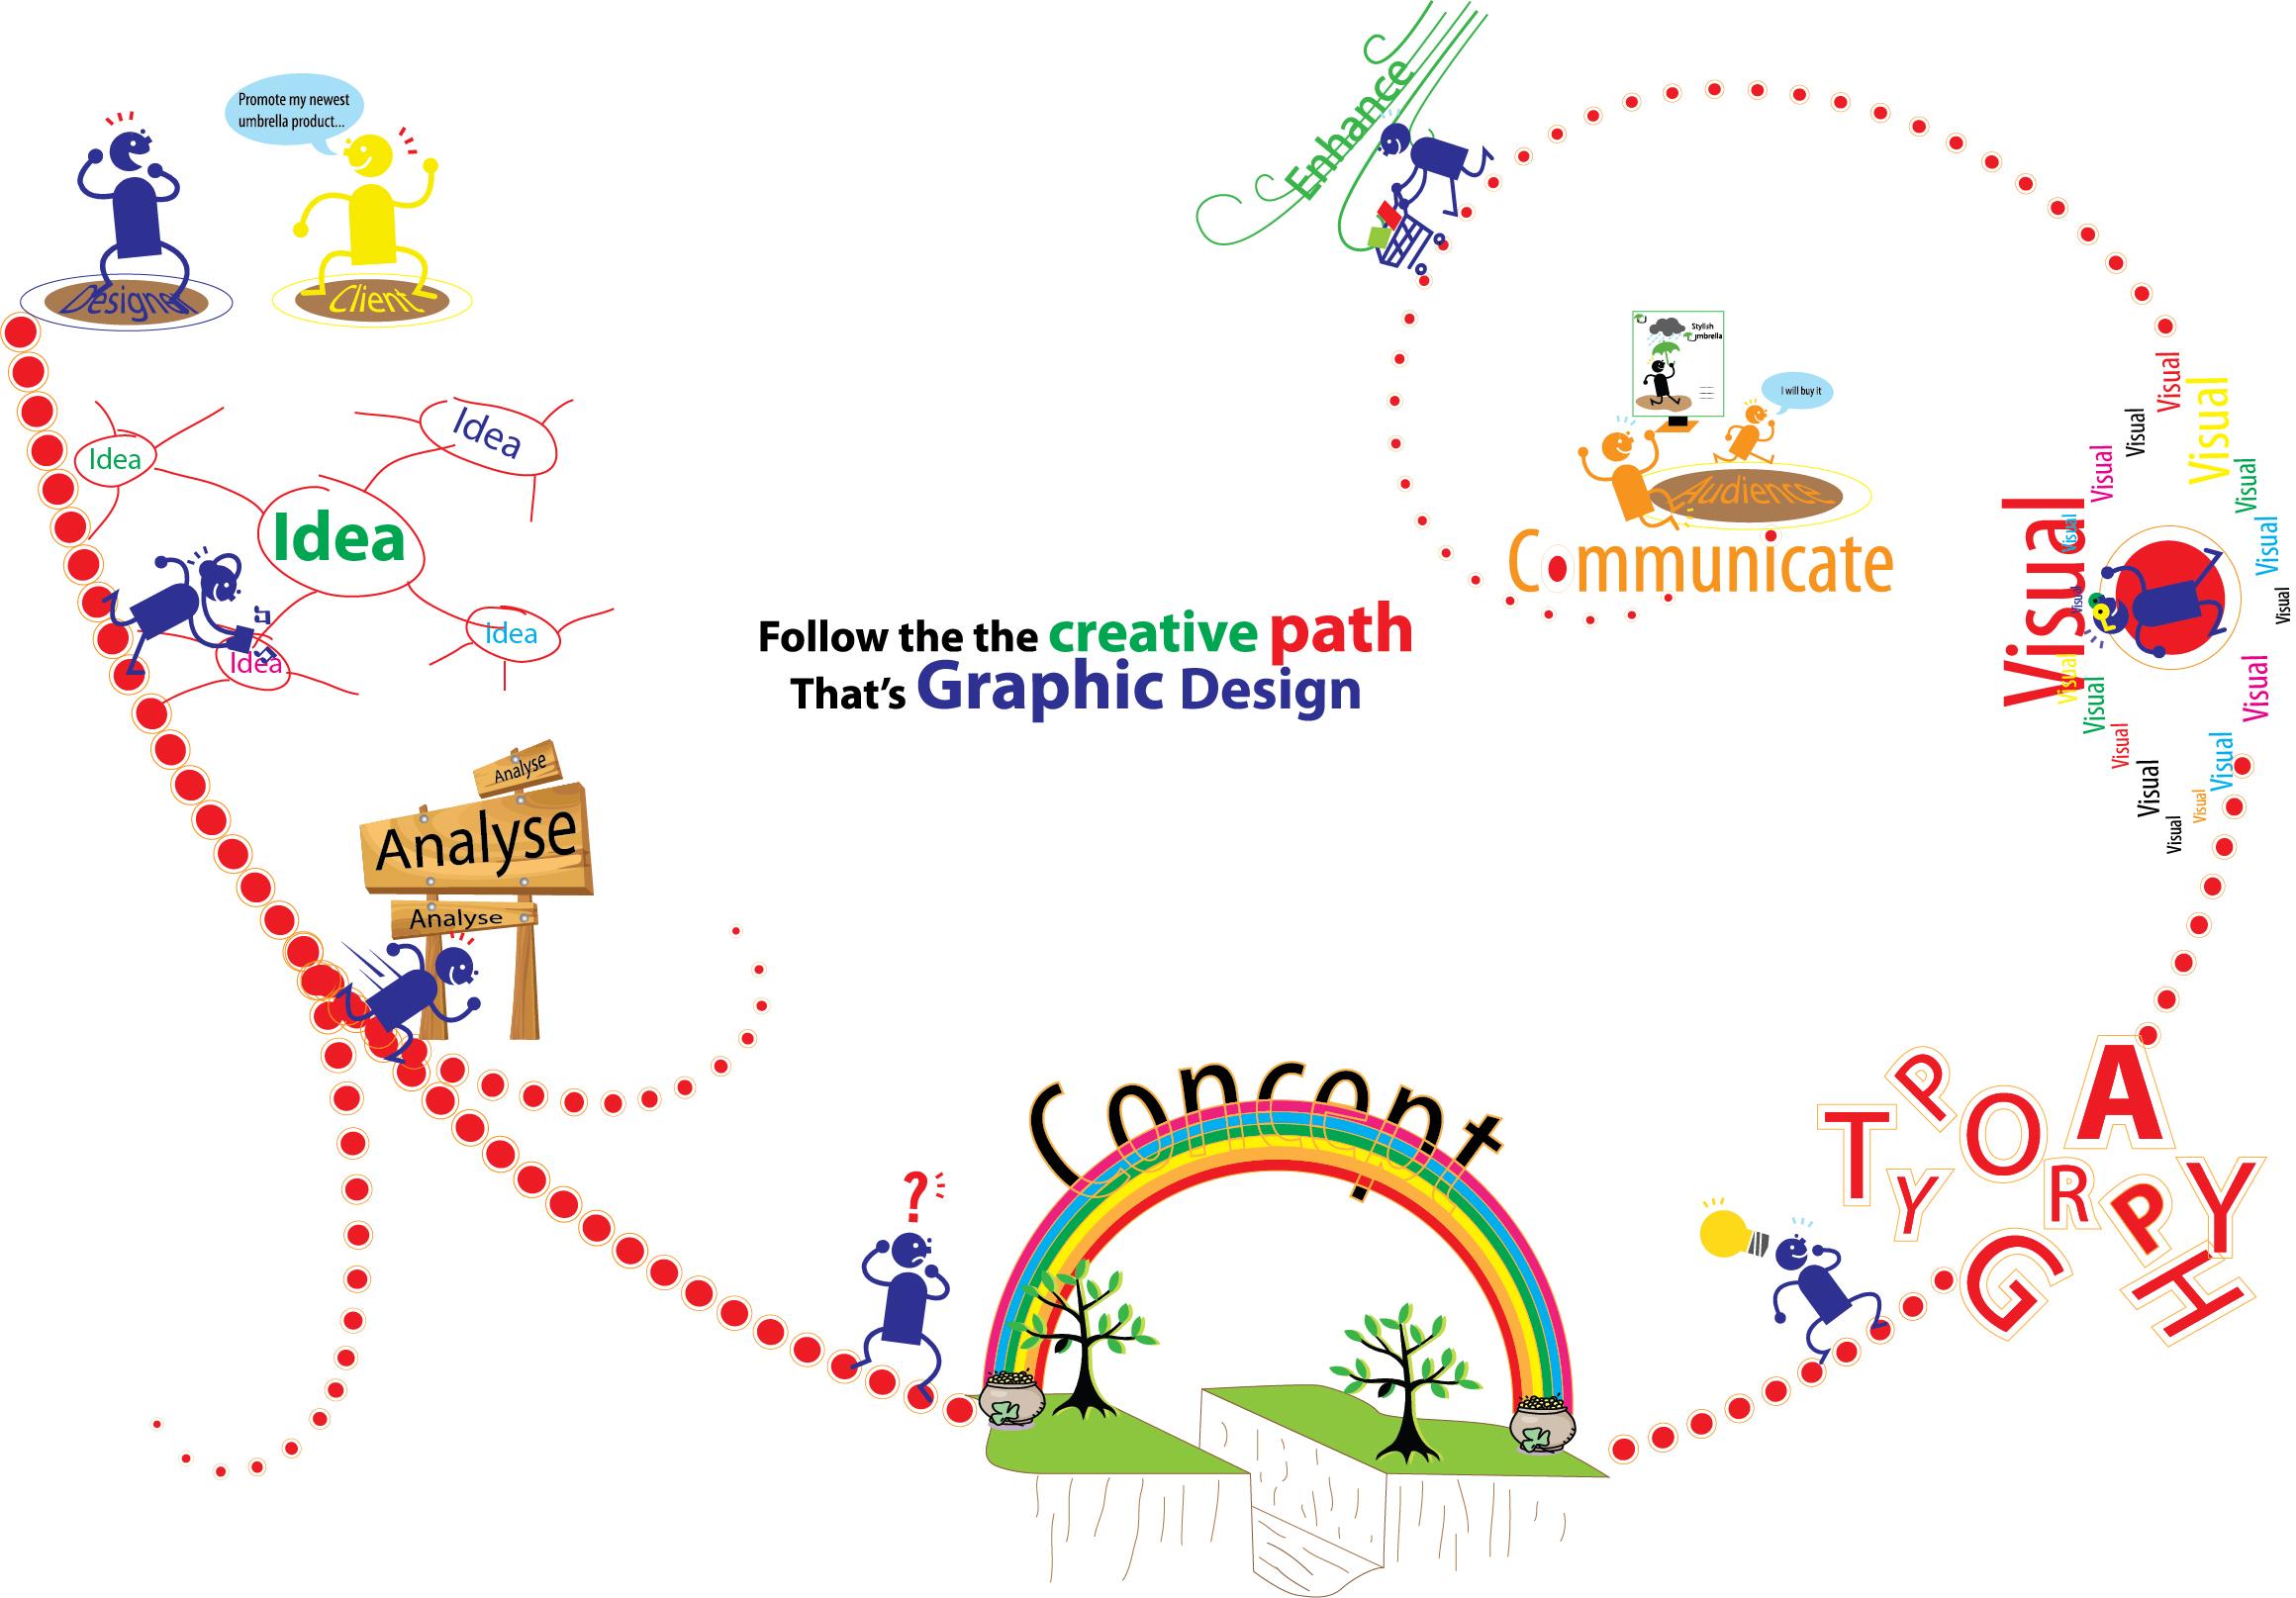 Golden_path_PUMA_team